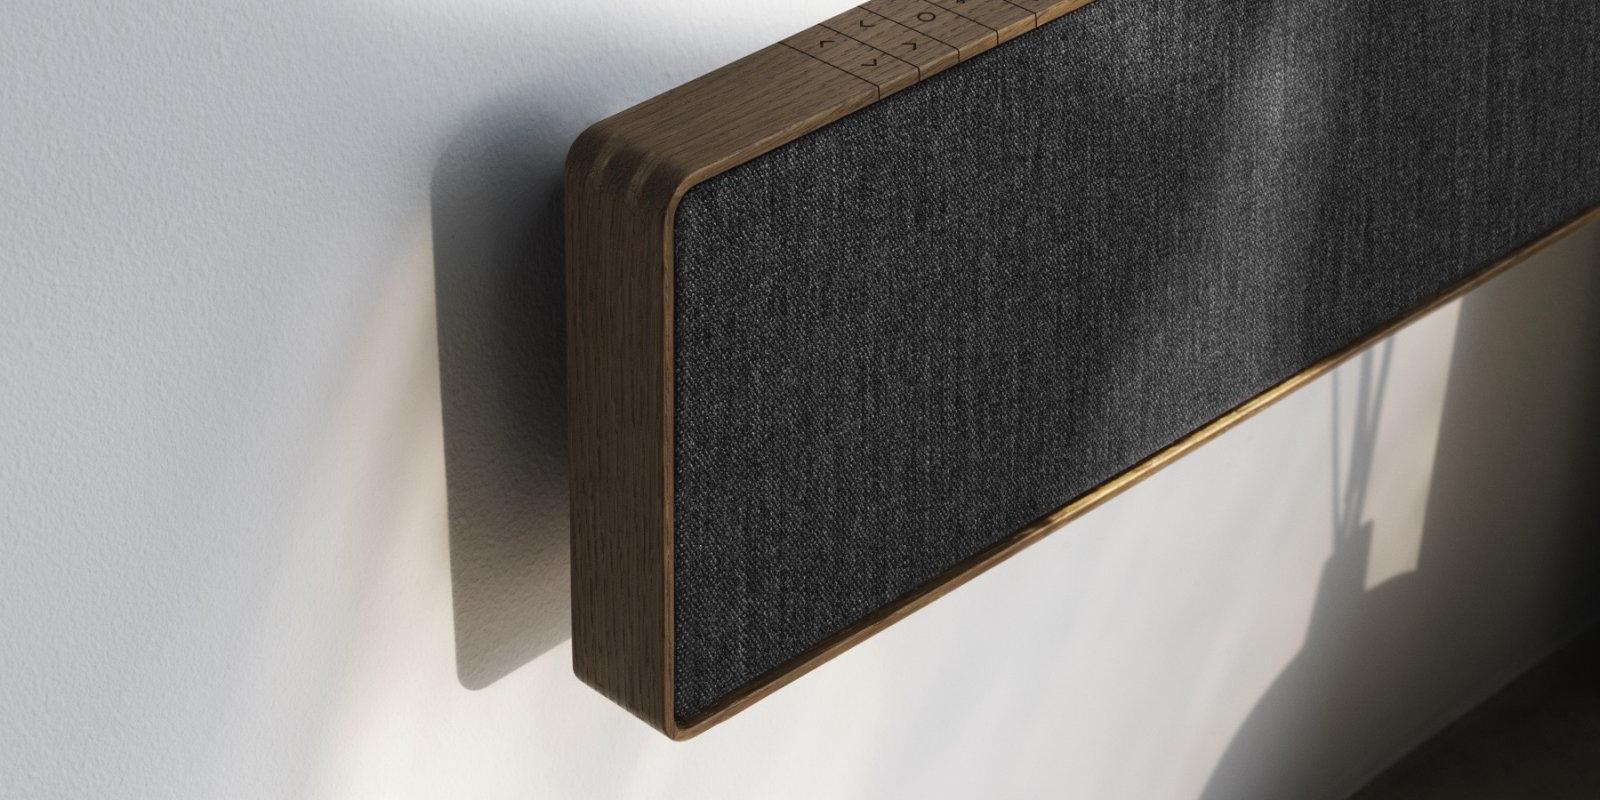 Bang & Olufsen unveils premium AirPlay 2 and Chromecast soundbar ahead of IFA